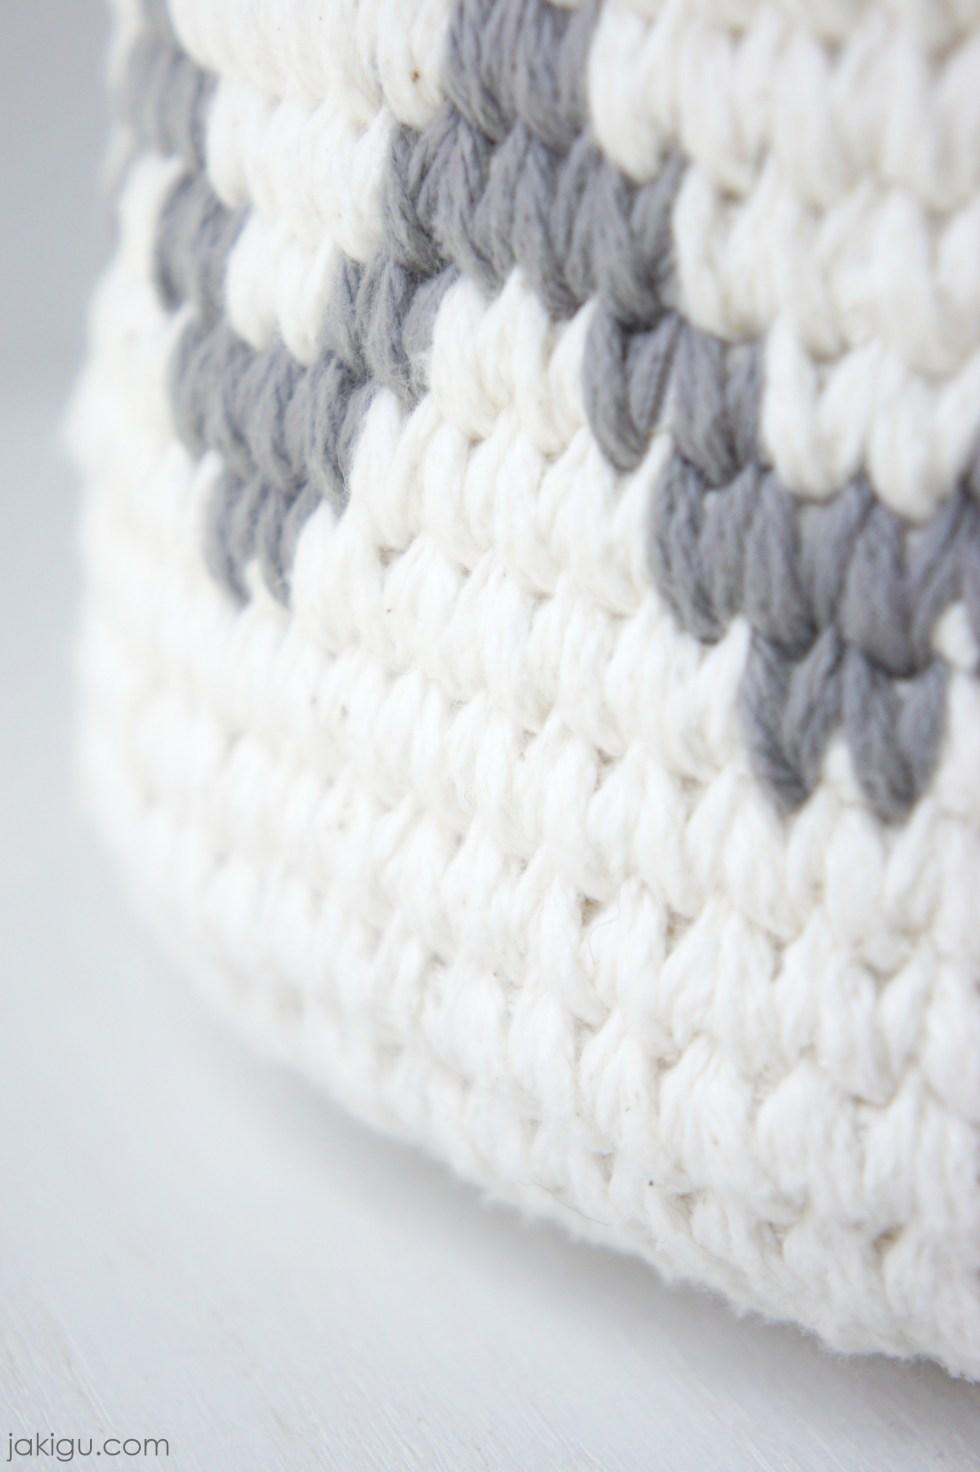 Waistcoat Stitch, crochet basket design by jakigu.com